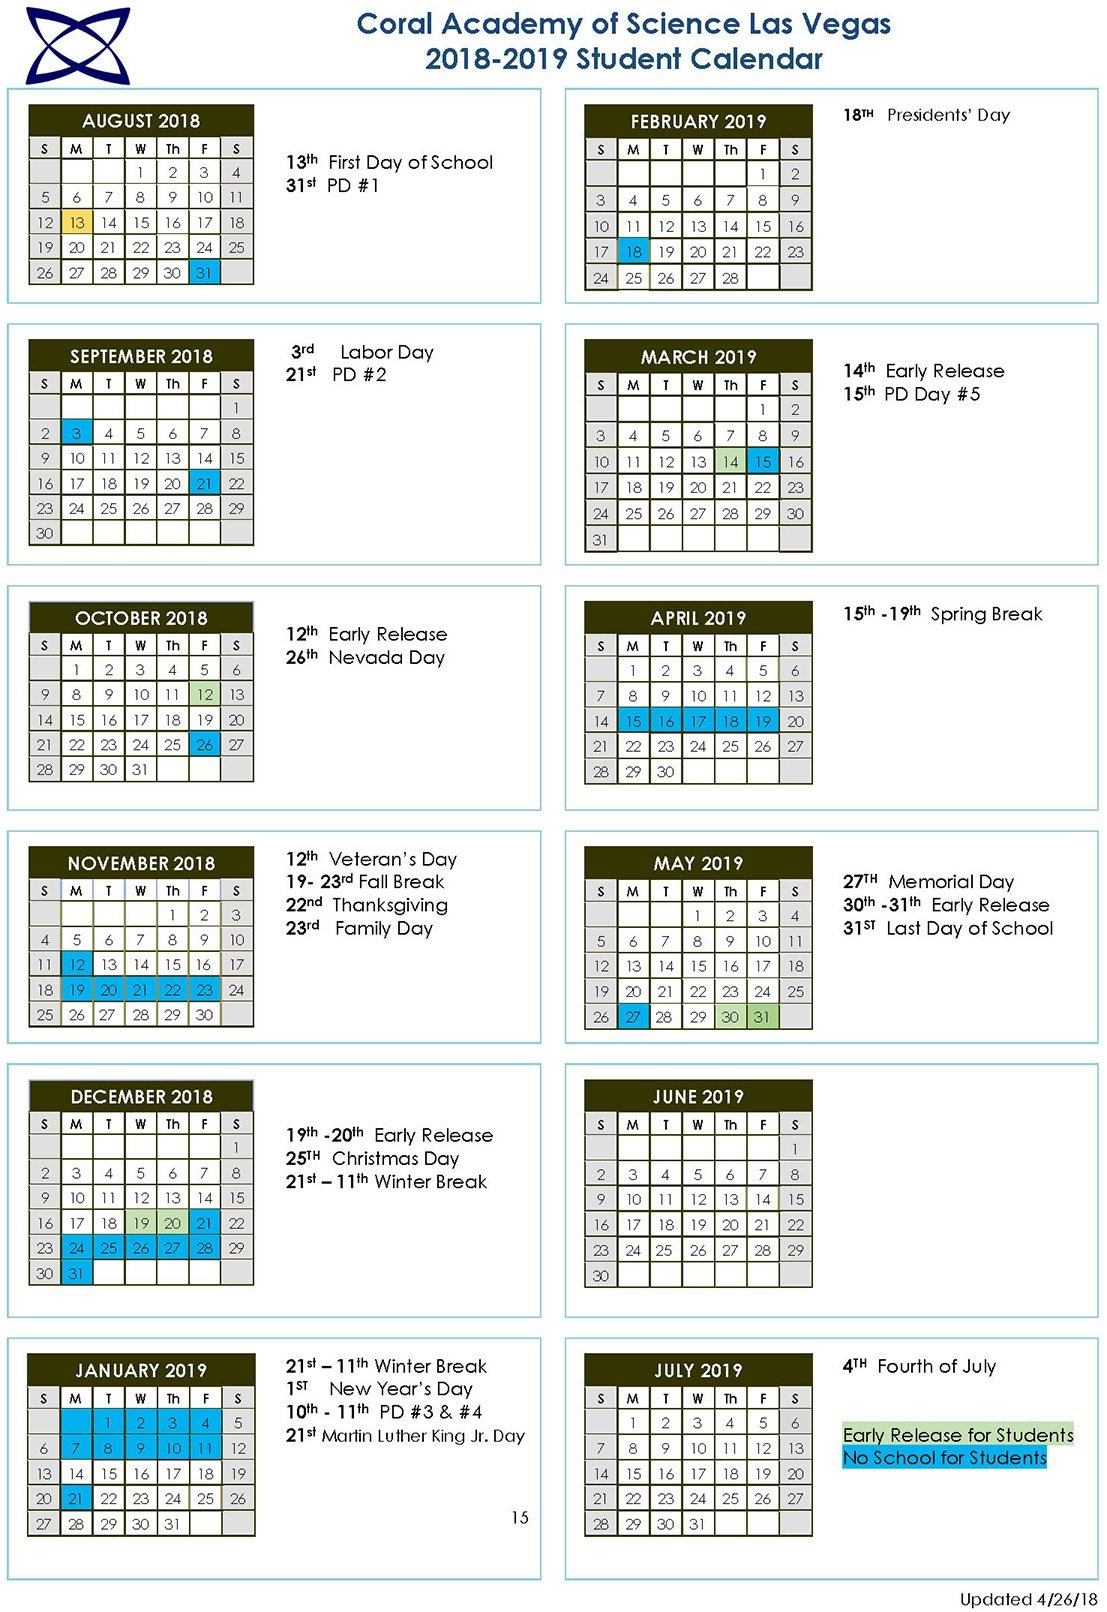 School Calendar 2018 2019 | Coral Academy Of Science Las Vegas Calendar 2019 Thanksgiving